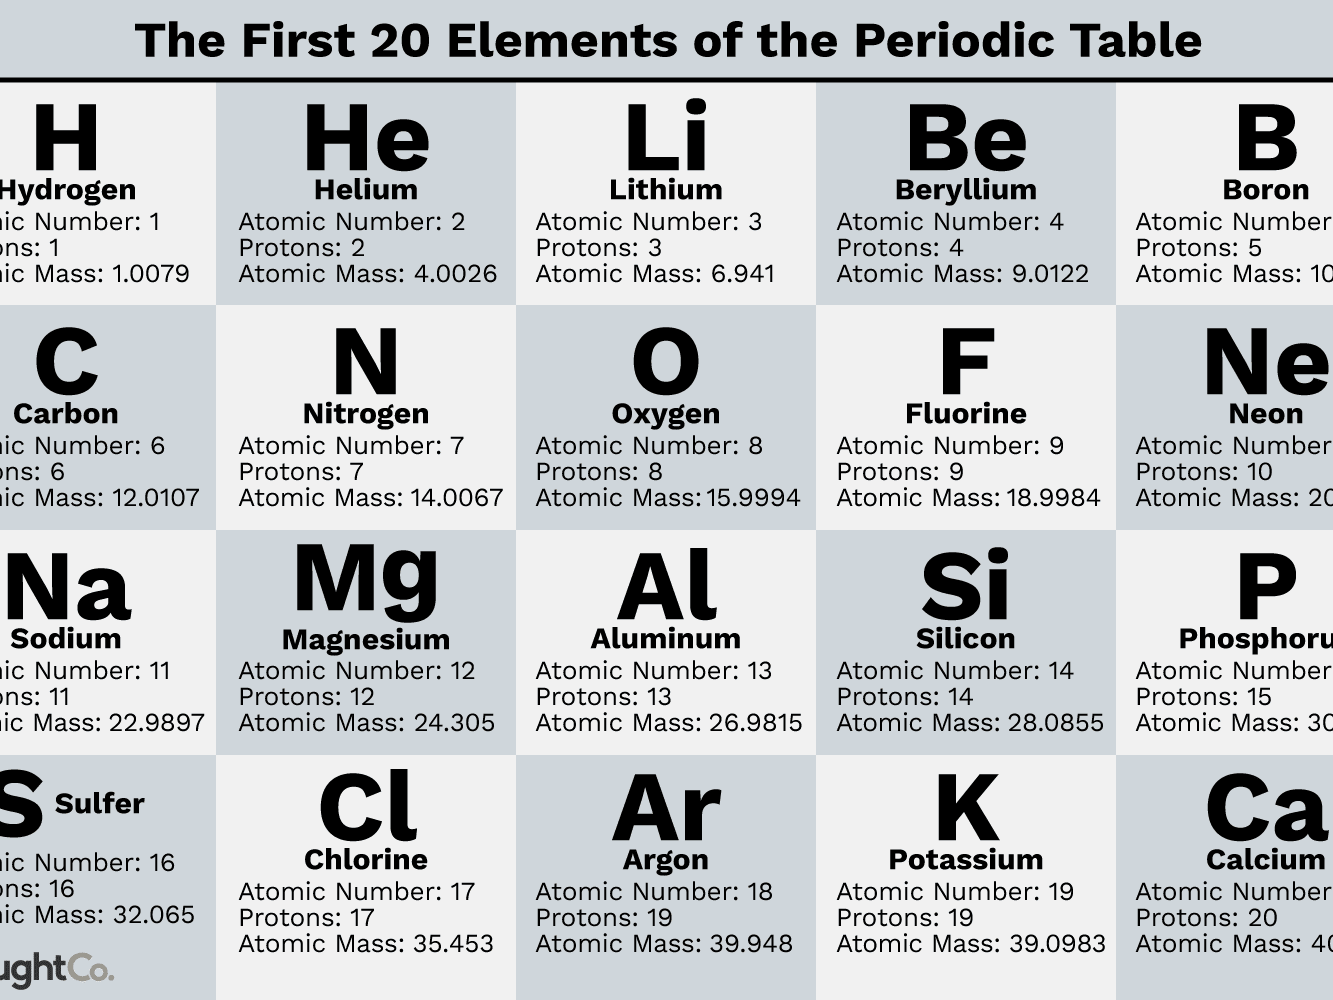 Helium Chemical Makeup